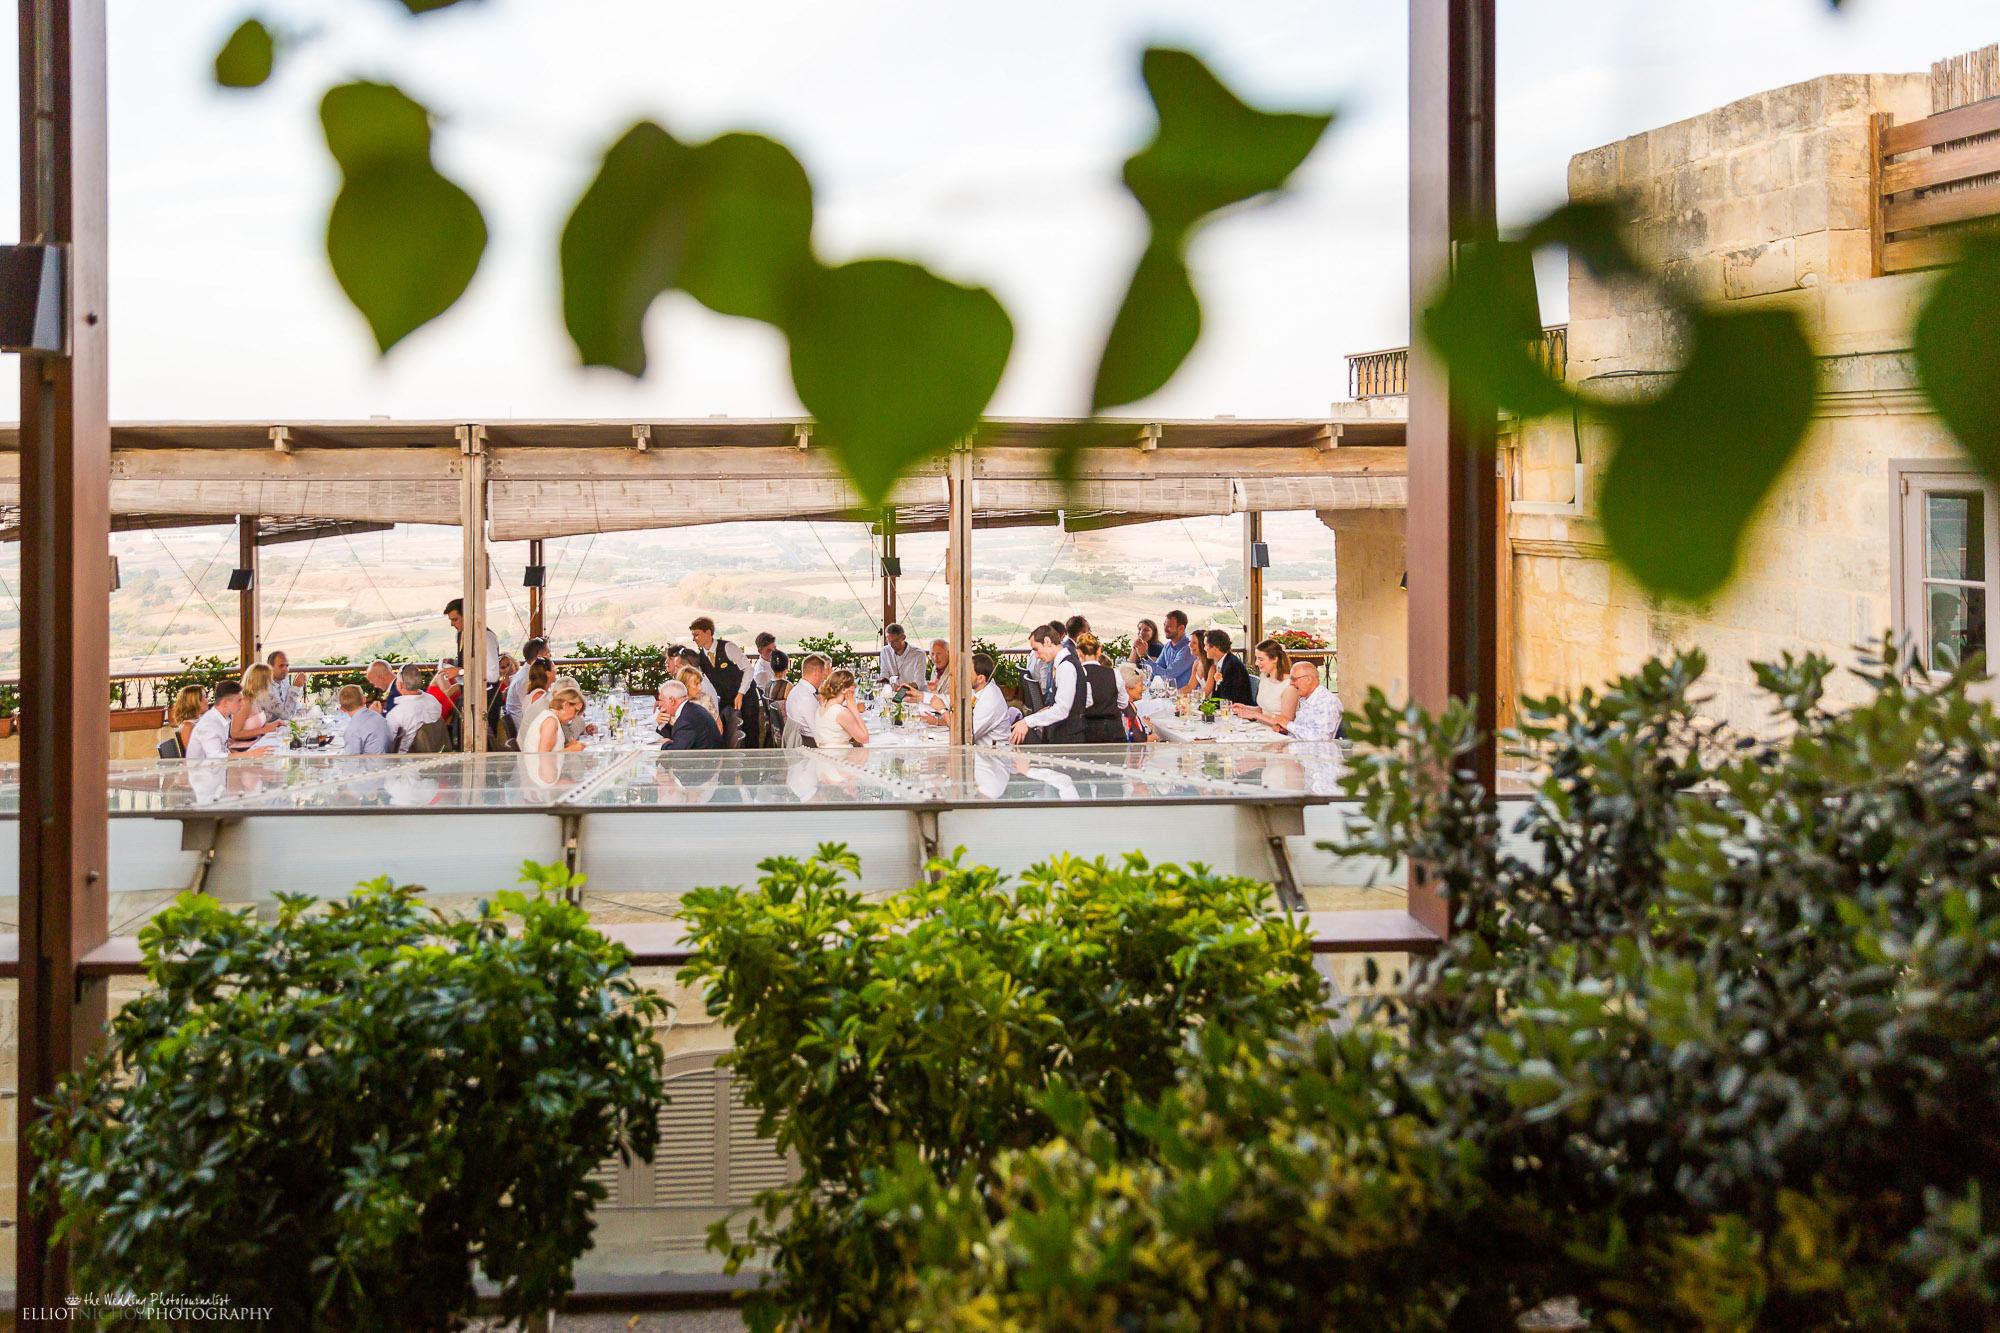 Xara-Palace-rooftop-wedding-reception-destination-weddings-photographer